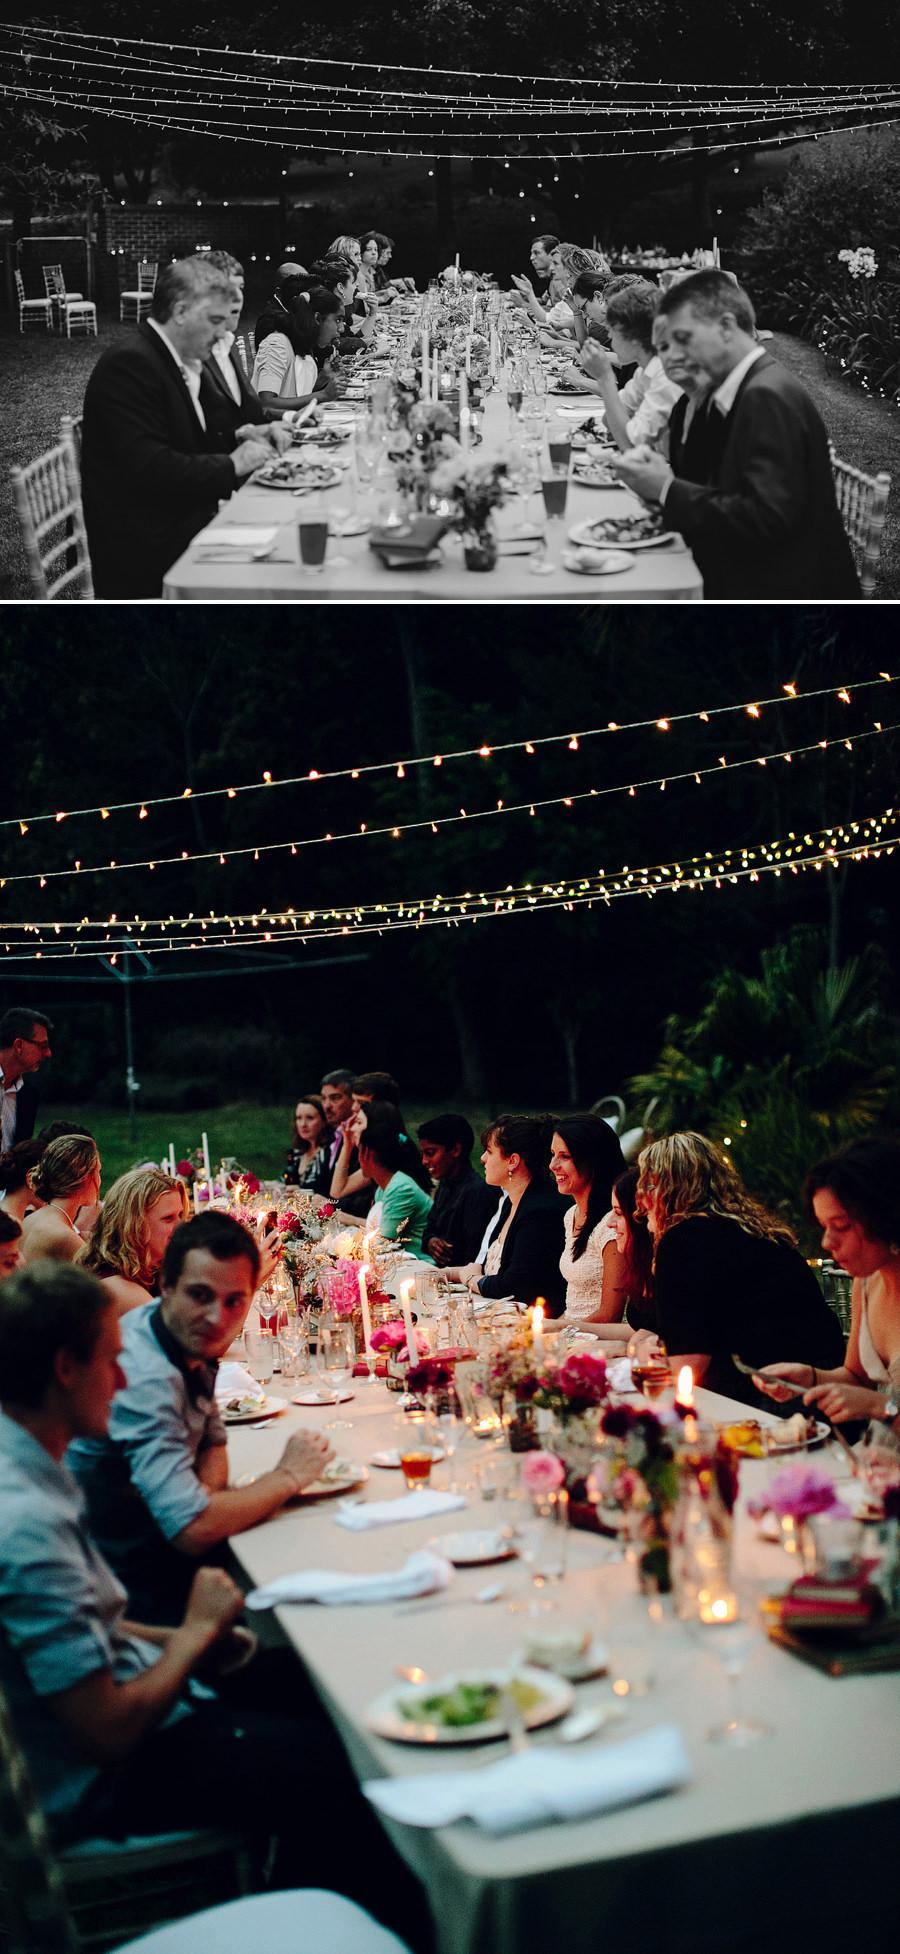 Sydney 21st Photographers: Dinner party